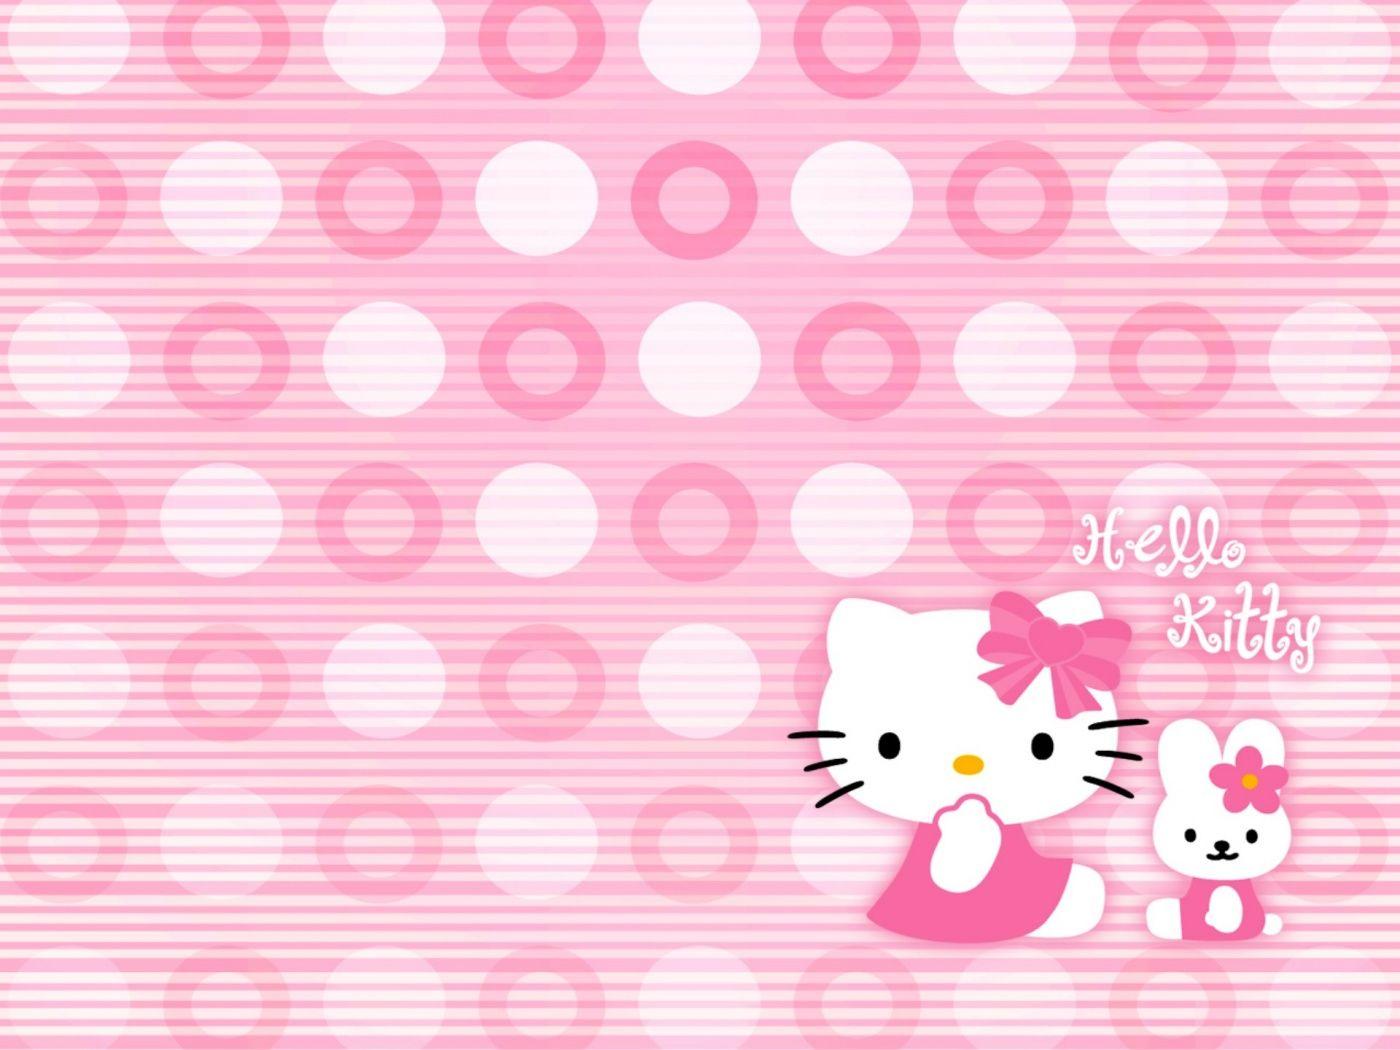 Hello Kitty Wallpaper Download Desktop Backgrounds For Free Hd 1366 768 Hello Kitty Wallpa Hello Kitty Wallpaper Hello Kitty Wallpaper Hd Hello Kitty Pictures